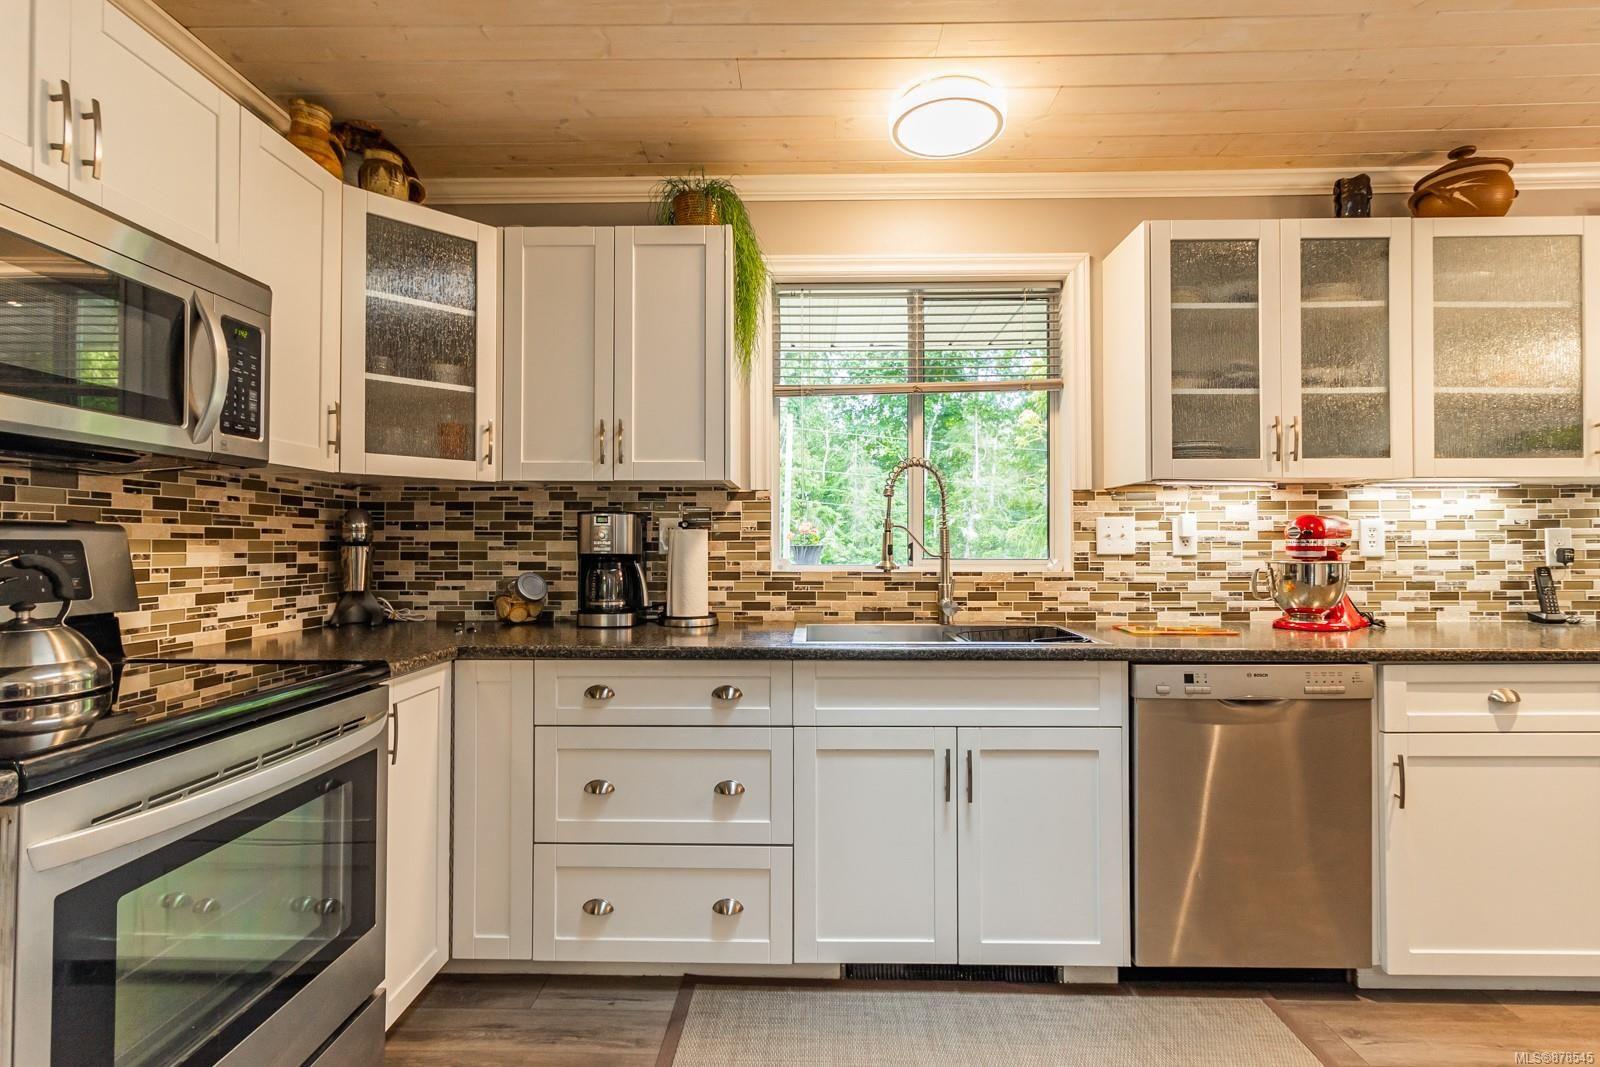 Photo 18: Photos: 1070 Symons Cres in : PQ Qualicum Beach House for sale (Parksville/Qualicum)  : MLS®# 878545